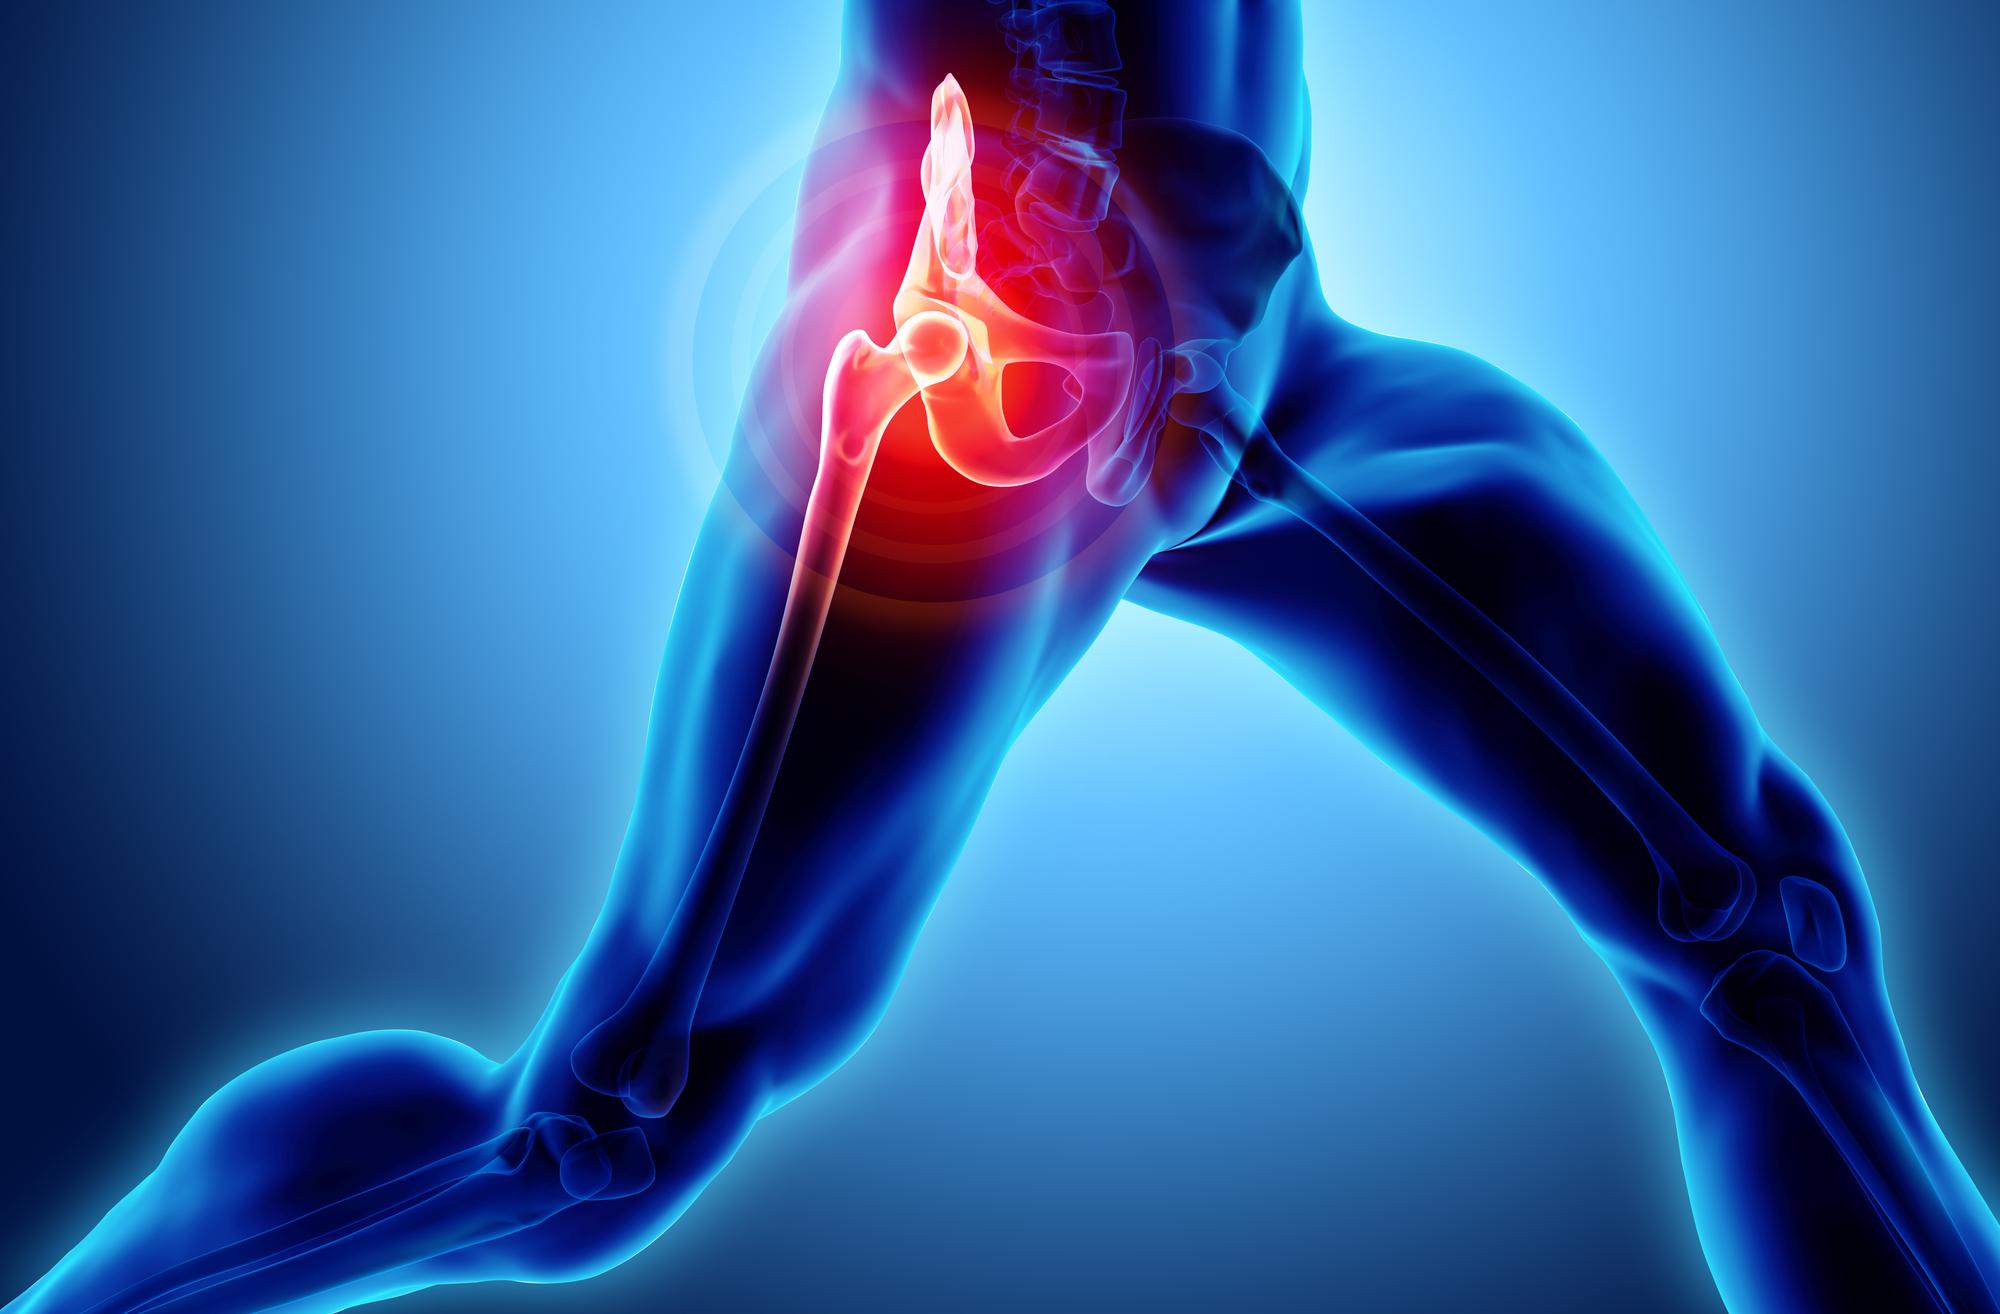 skeleton x-ray focus on hip pain